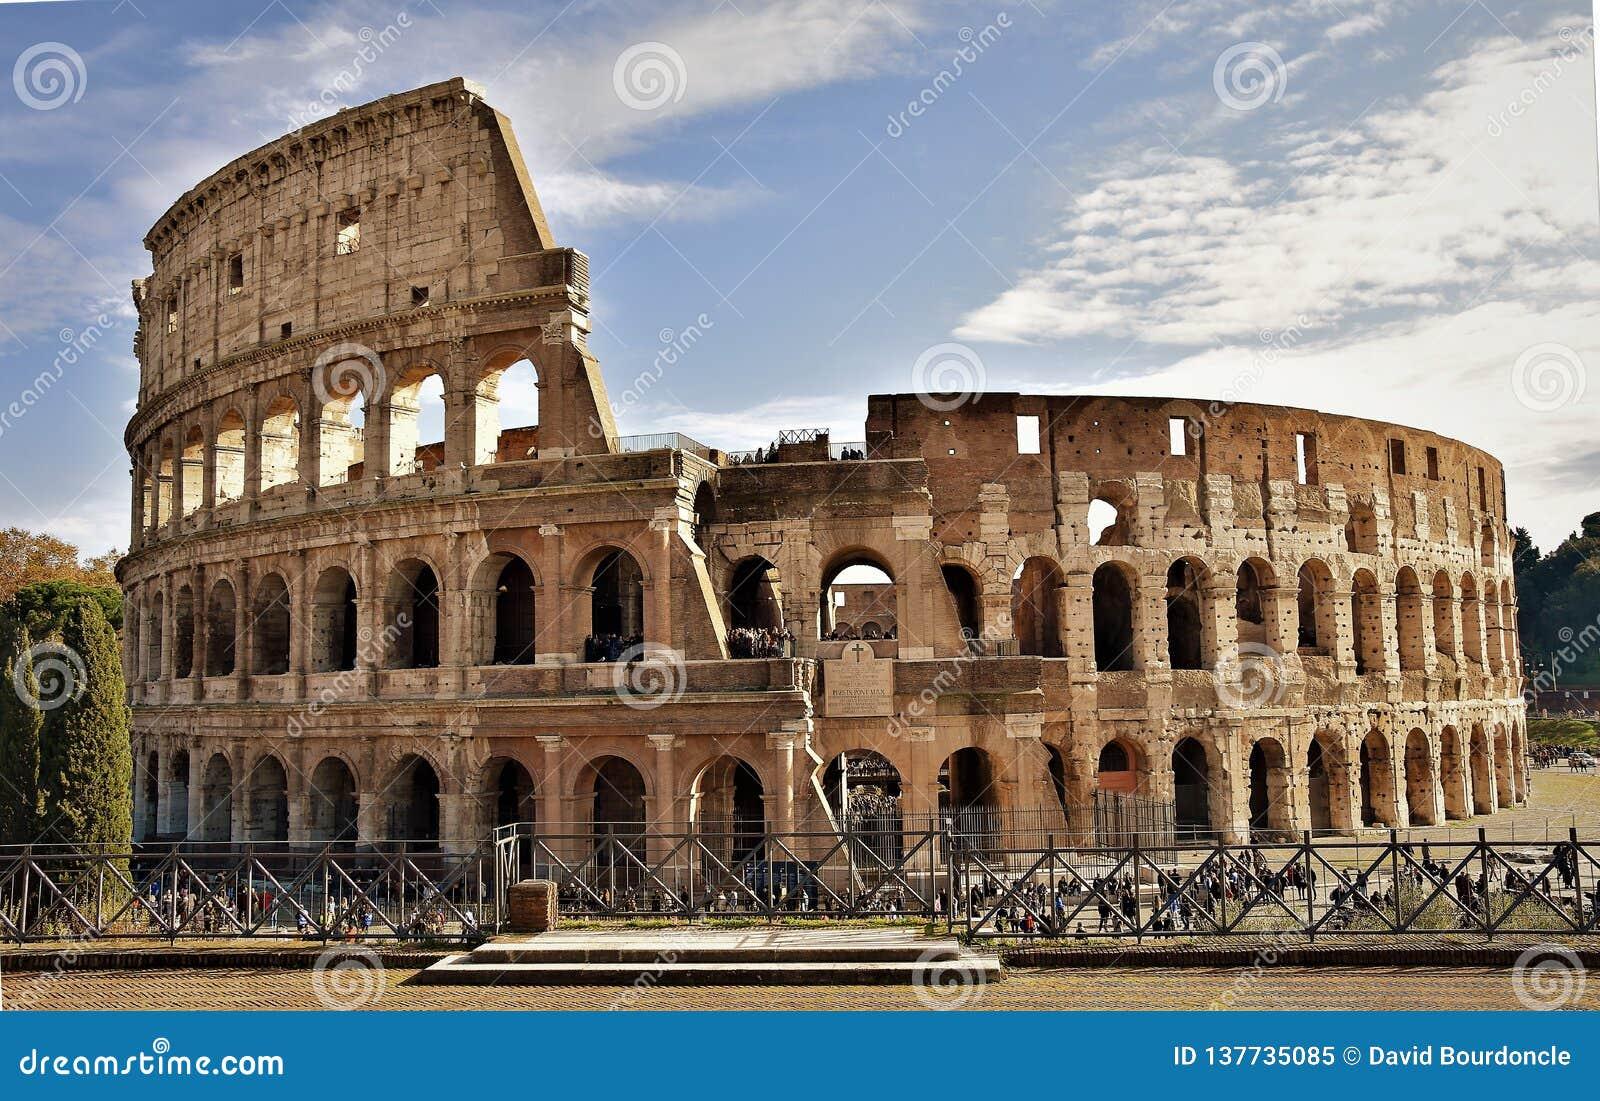 Romano colosseo του IL, Ιταλία